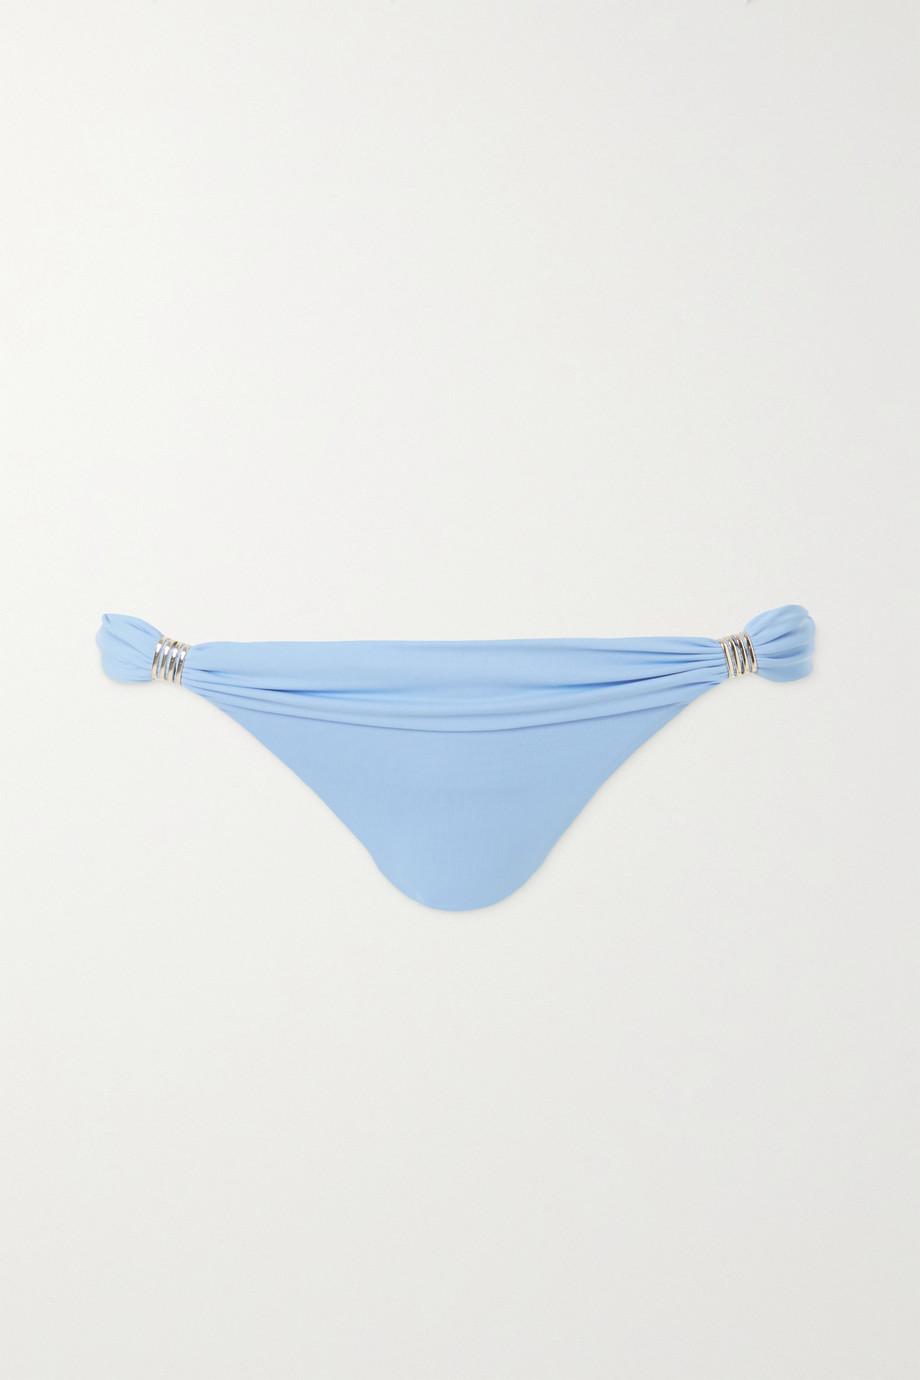 Melissa Odabash Grenada embellished bikini briefs